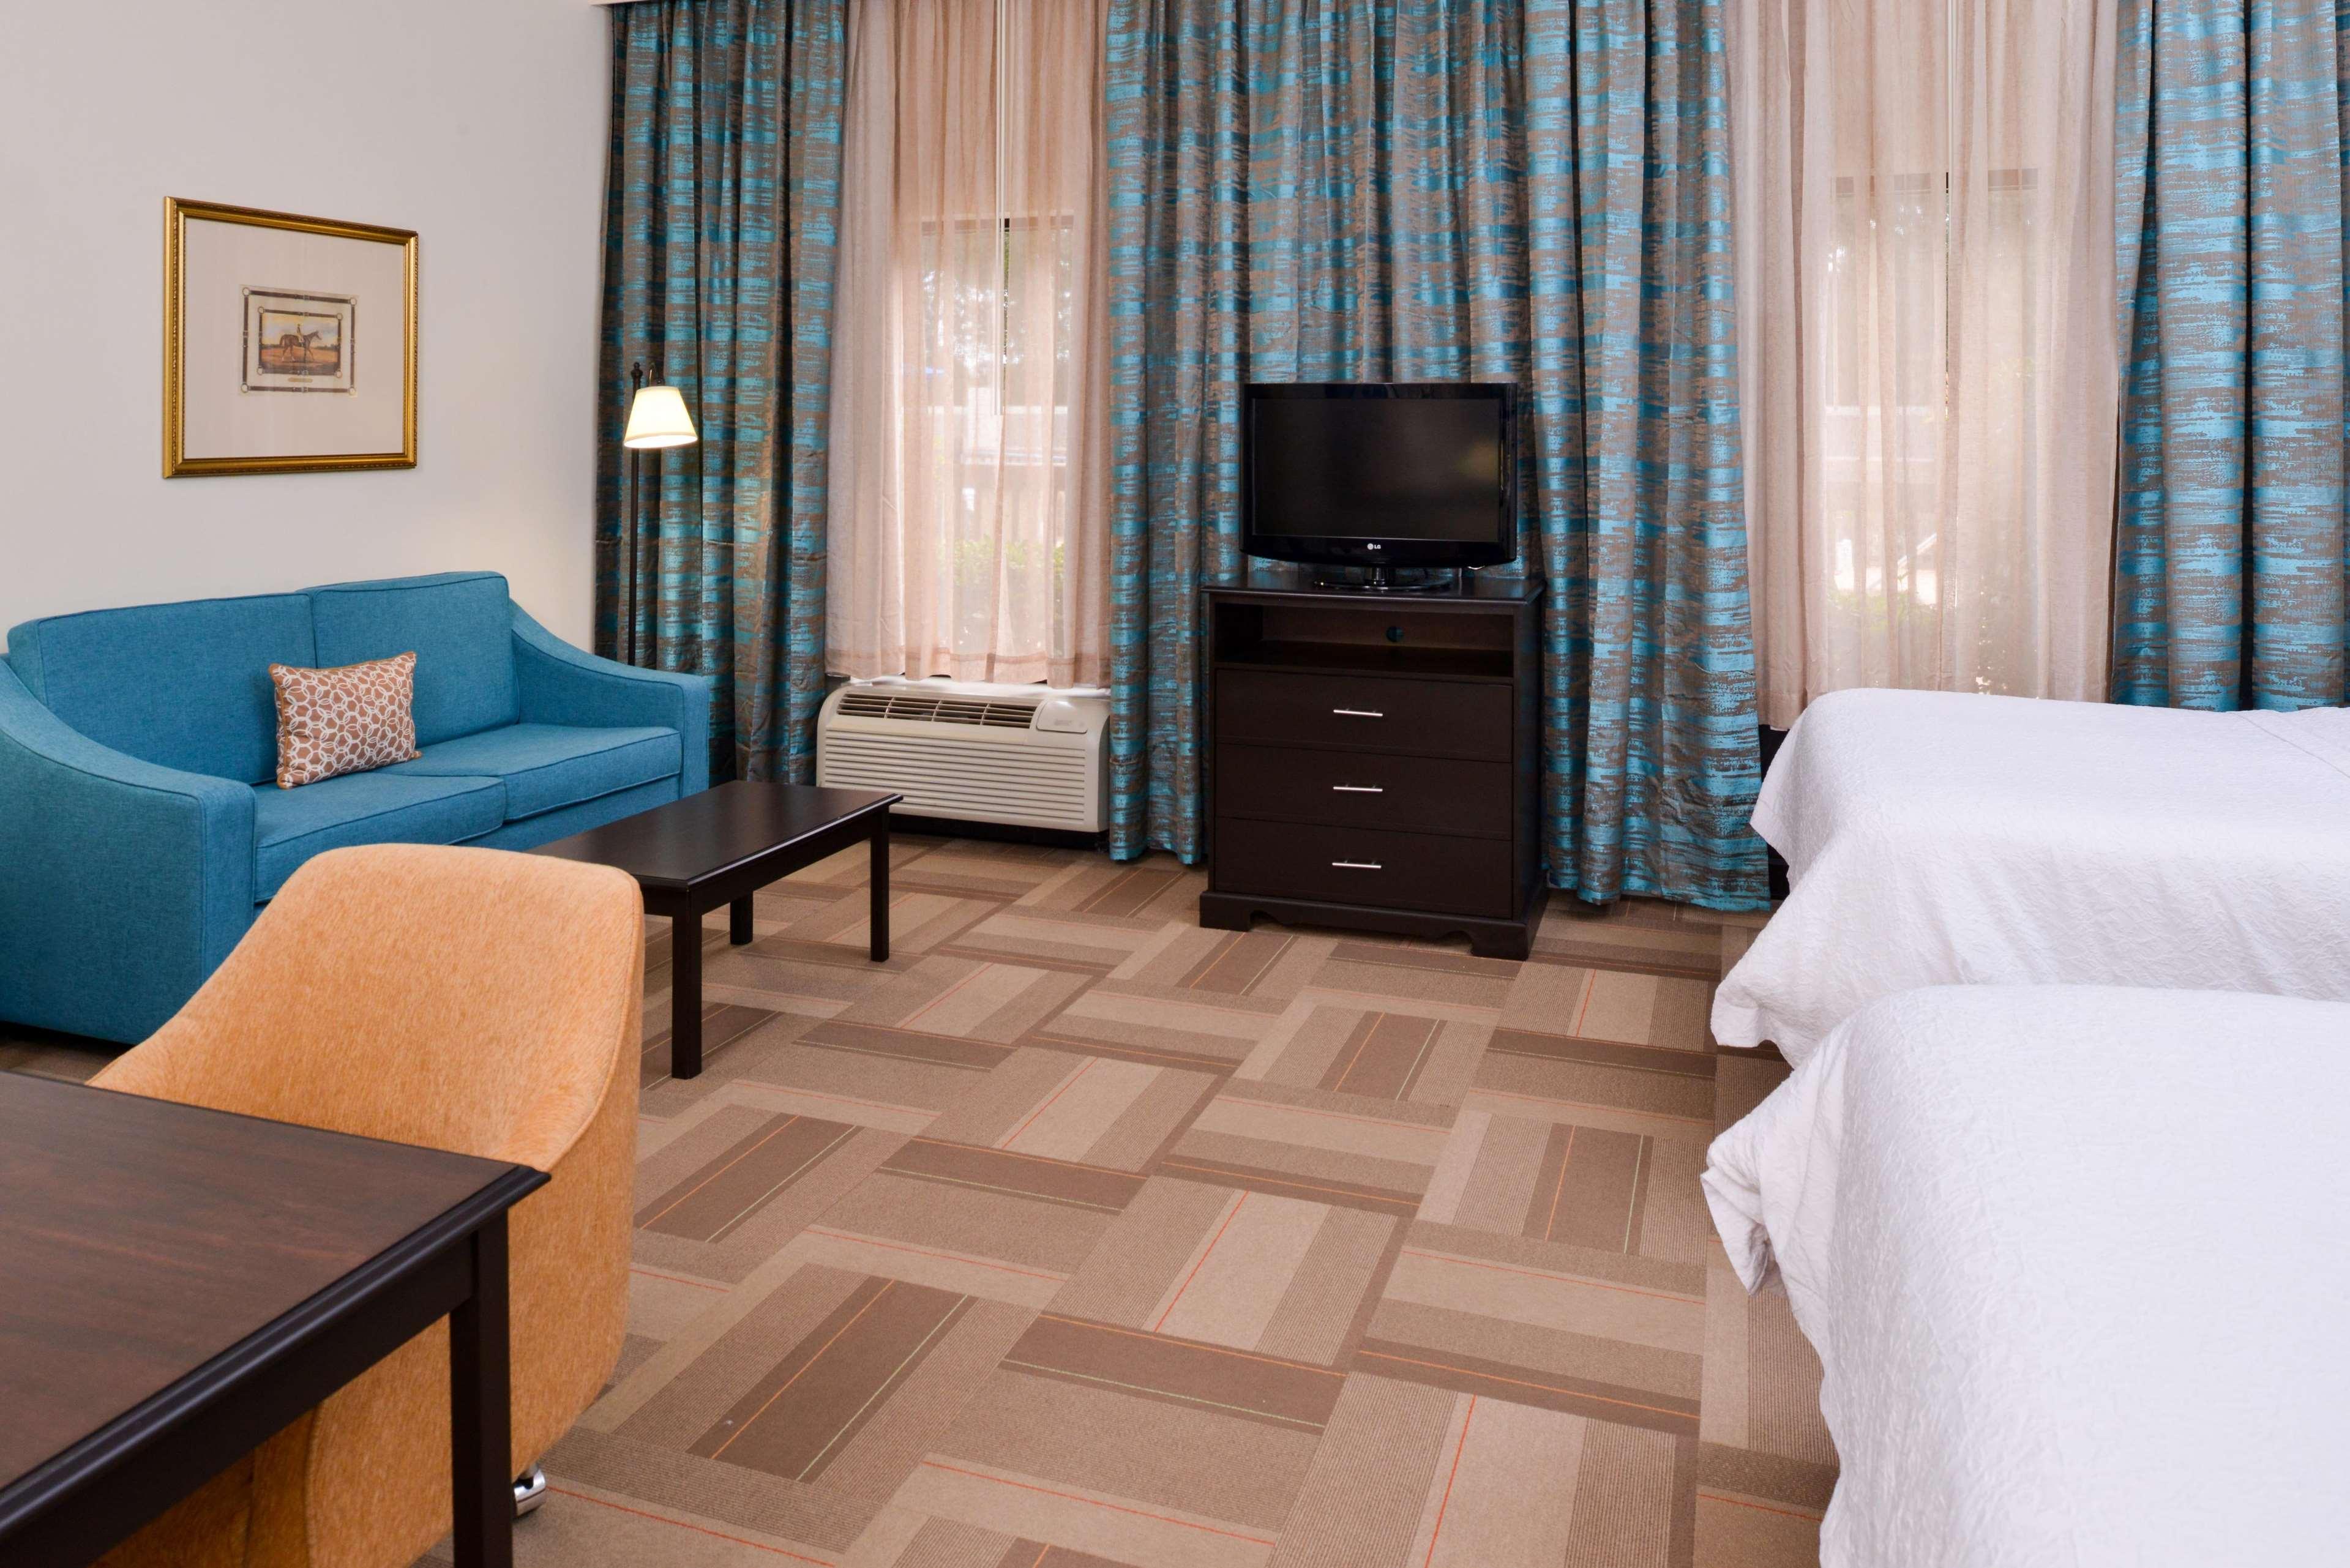 Hampton Inn & Suites Lady Lake/The Villages image 21